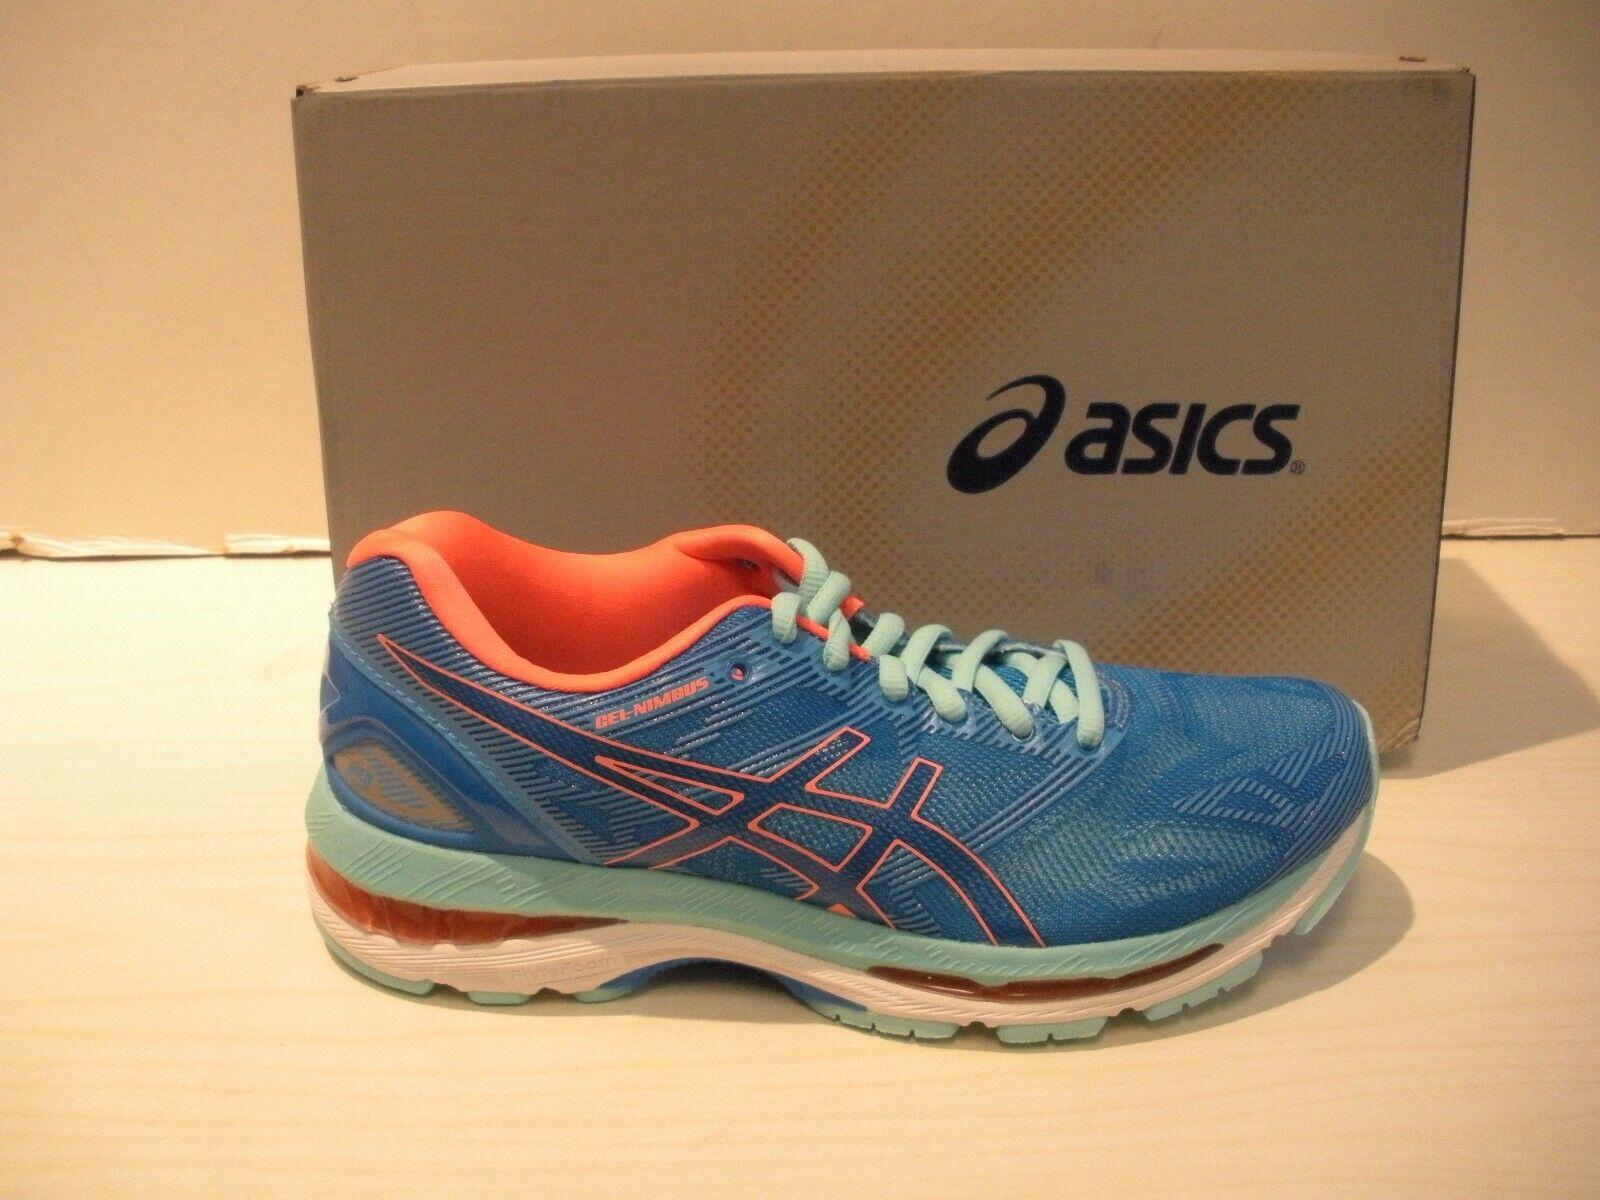 ASICS WOMENS GEL-NIMBUS 19 RUNNING SHOES-SNEAKERS-T750N-4987- DIVA blueE- 7, 9